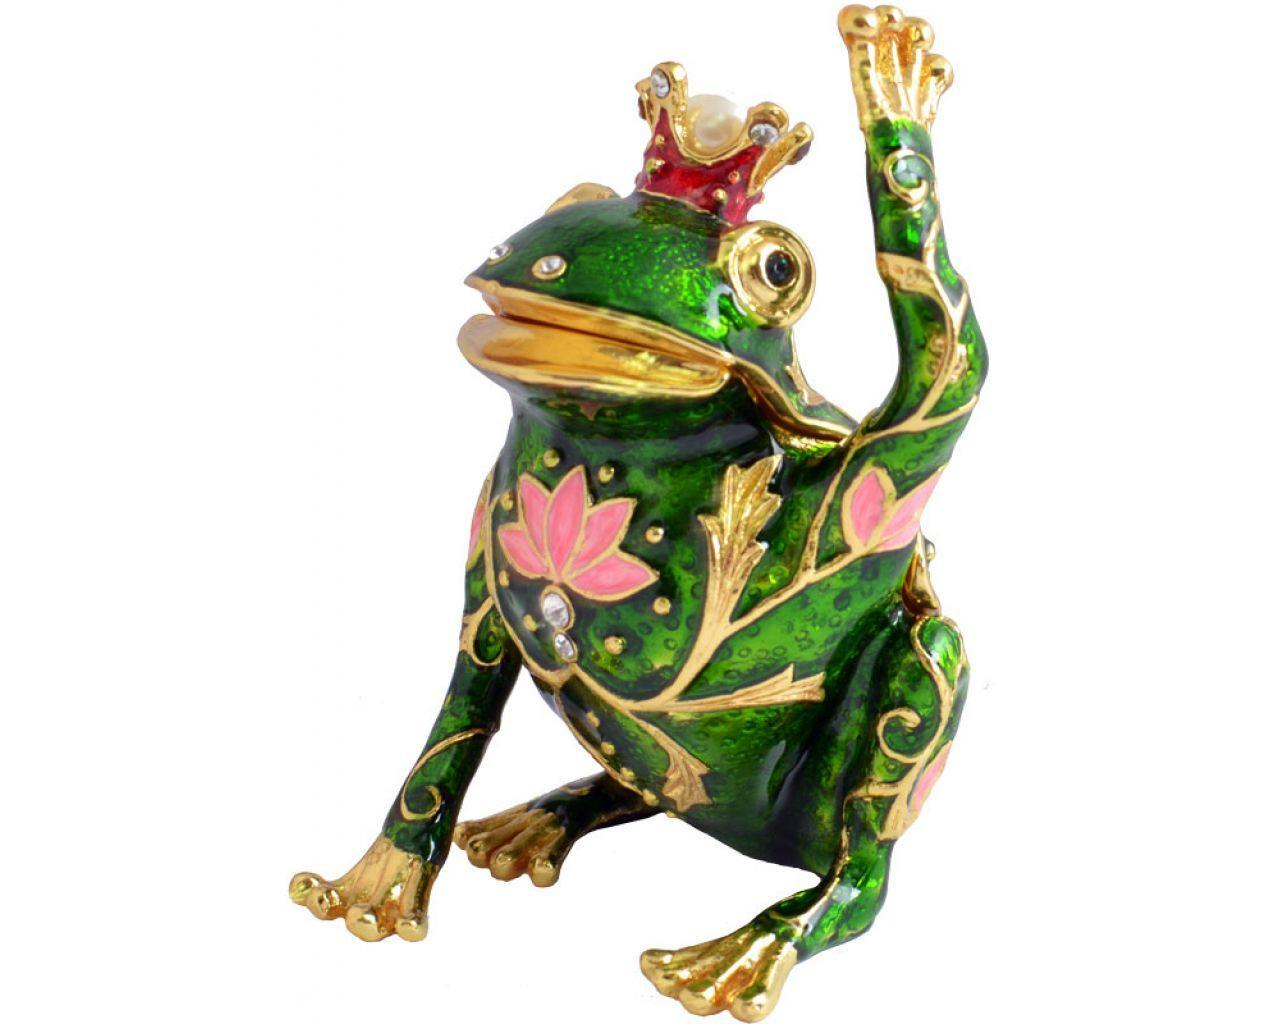 Шкатулка для украшений царевна лягушка